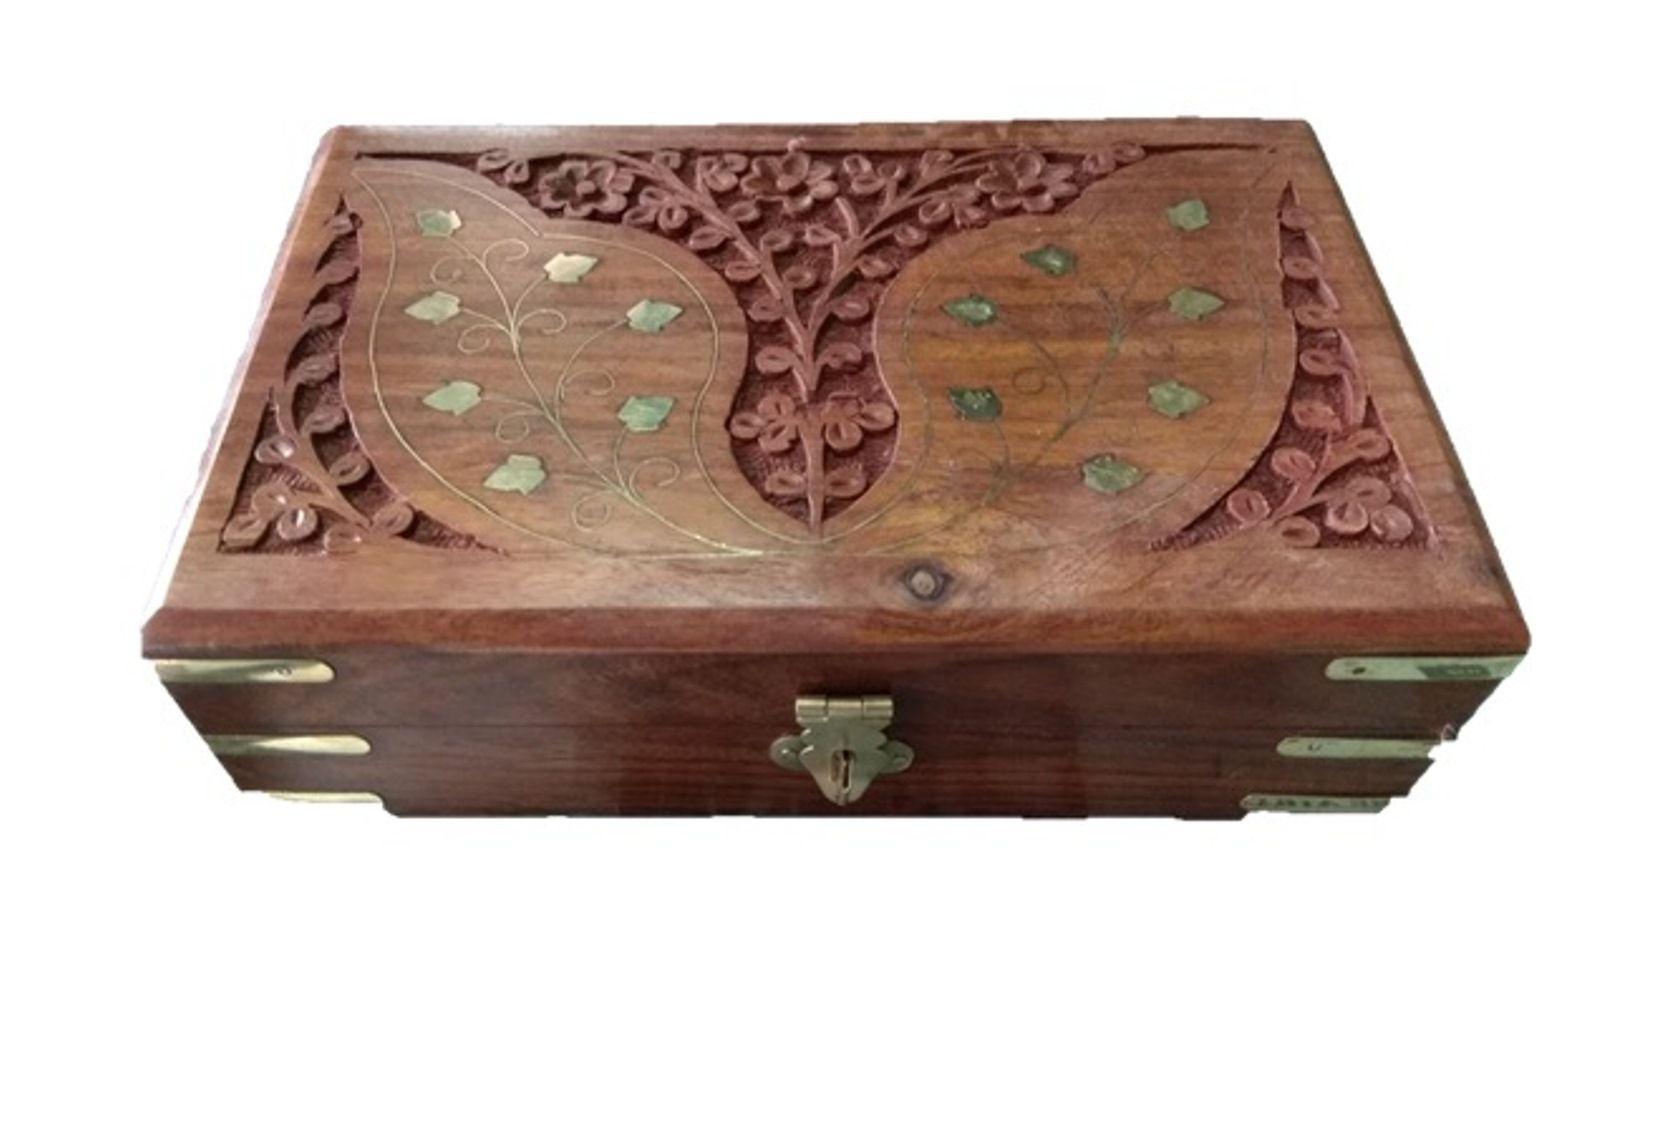 Royals Jewellery Box Flap carving pattern handmade